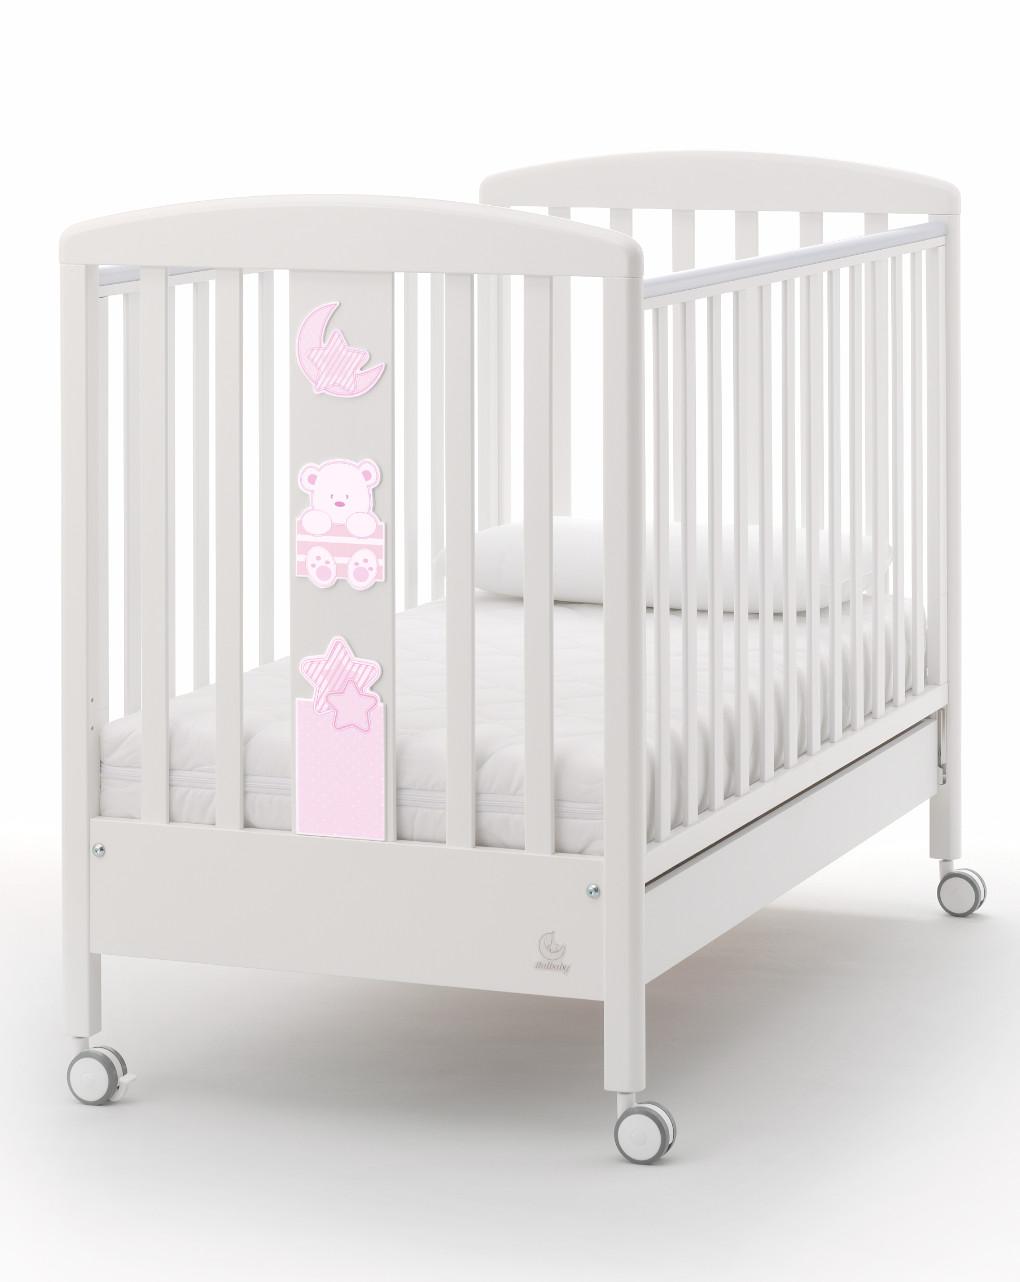 Italbaby Κούνια My Teddy Ροζ 130x70x103 cm